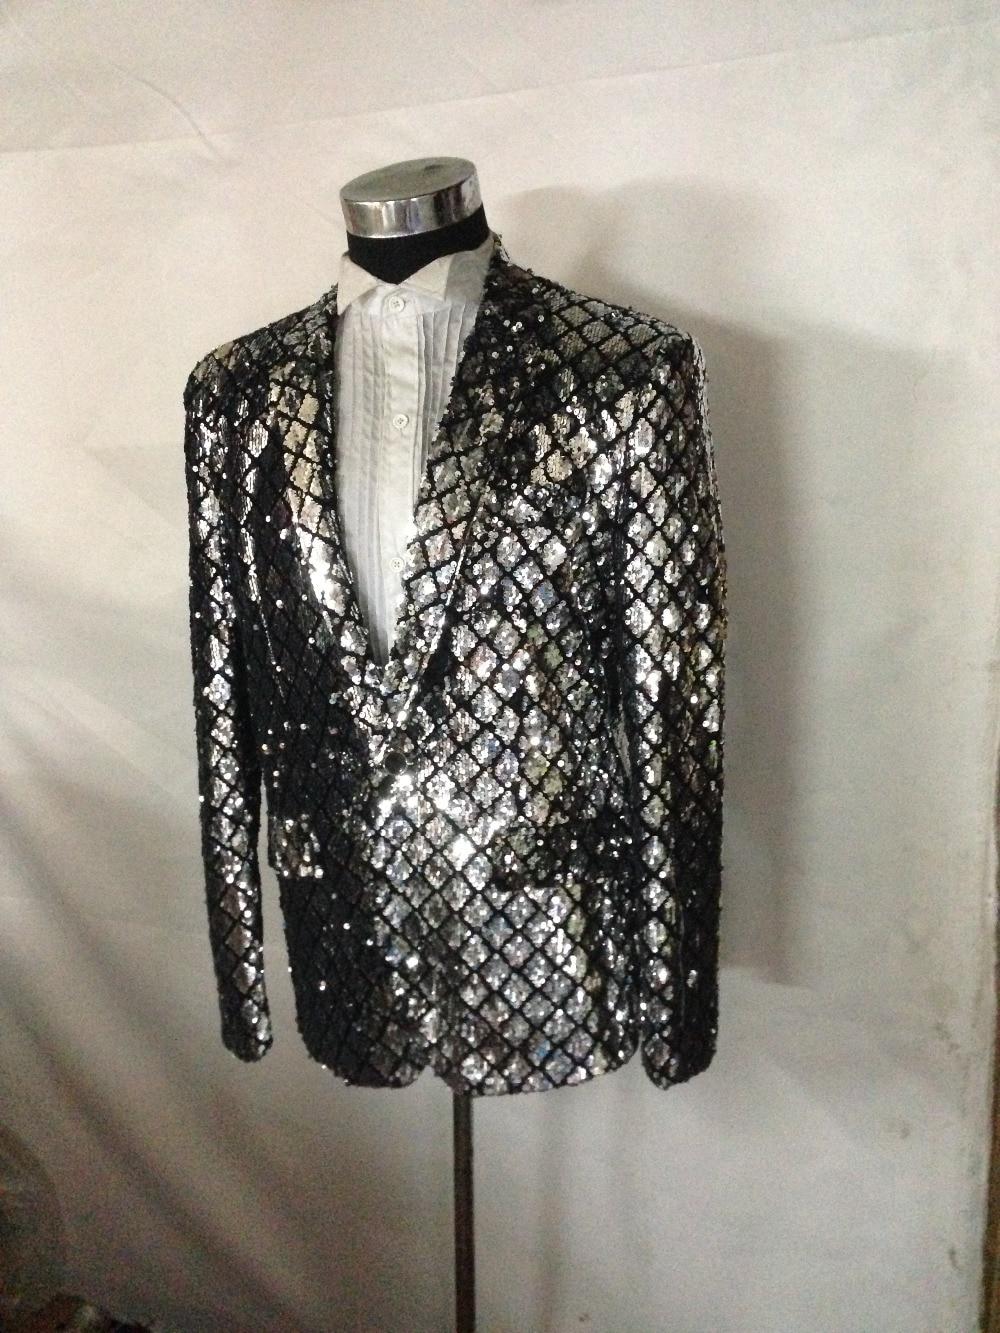 Customized New Fashion Men Black Plaid Blazers Sequined Suit Studio Dress Nightclub Bar Singer Host Stage Performance Jacket